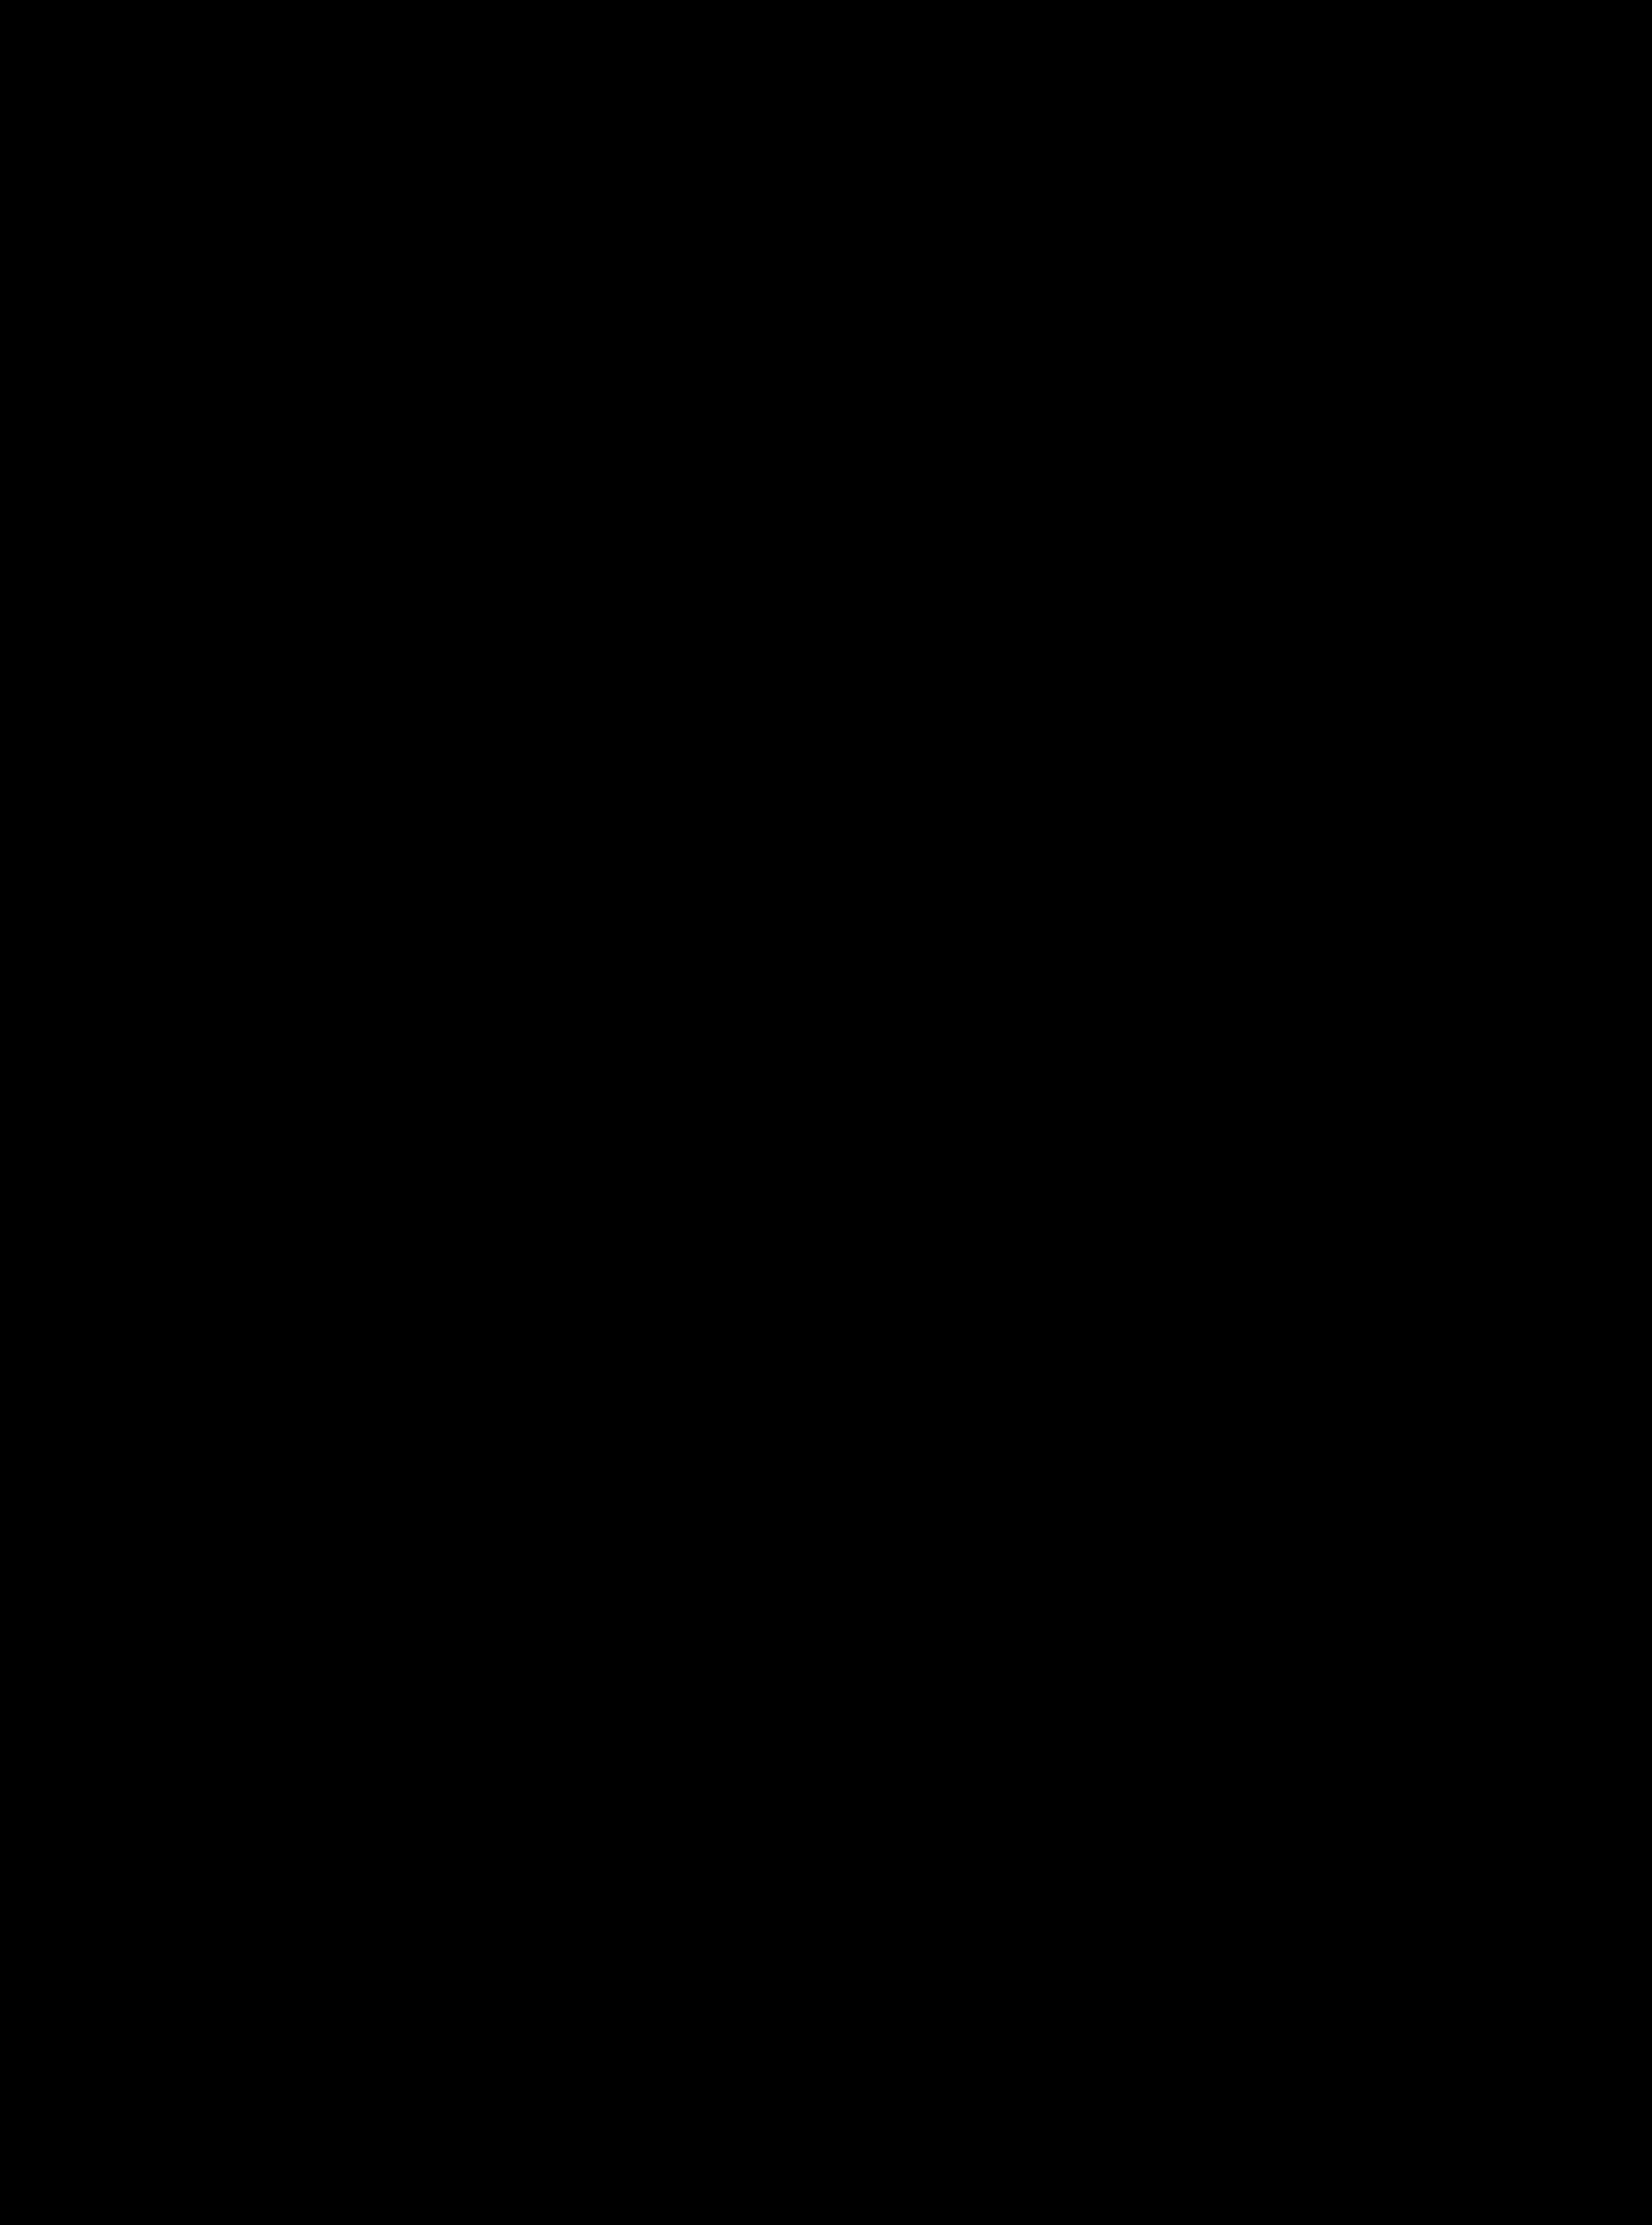 Stunt clipart Silhouette Silhouette Stunt BMX BMX